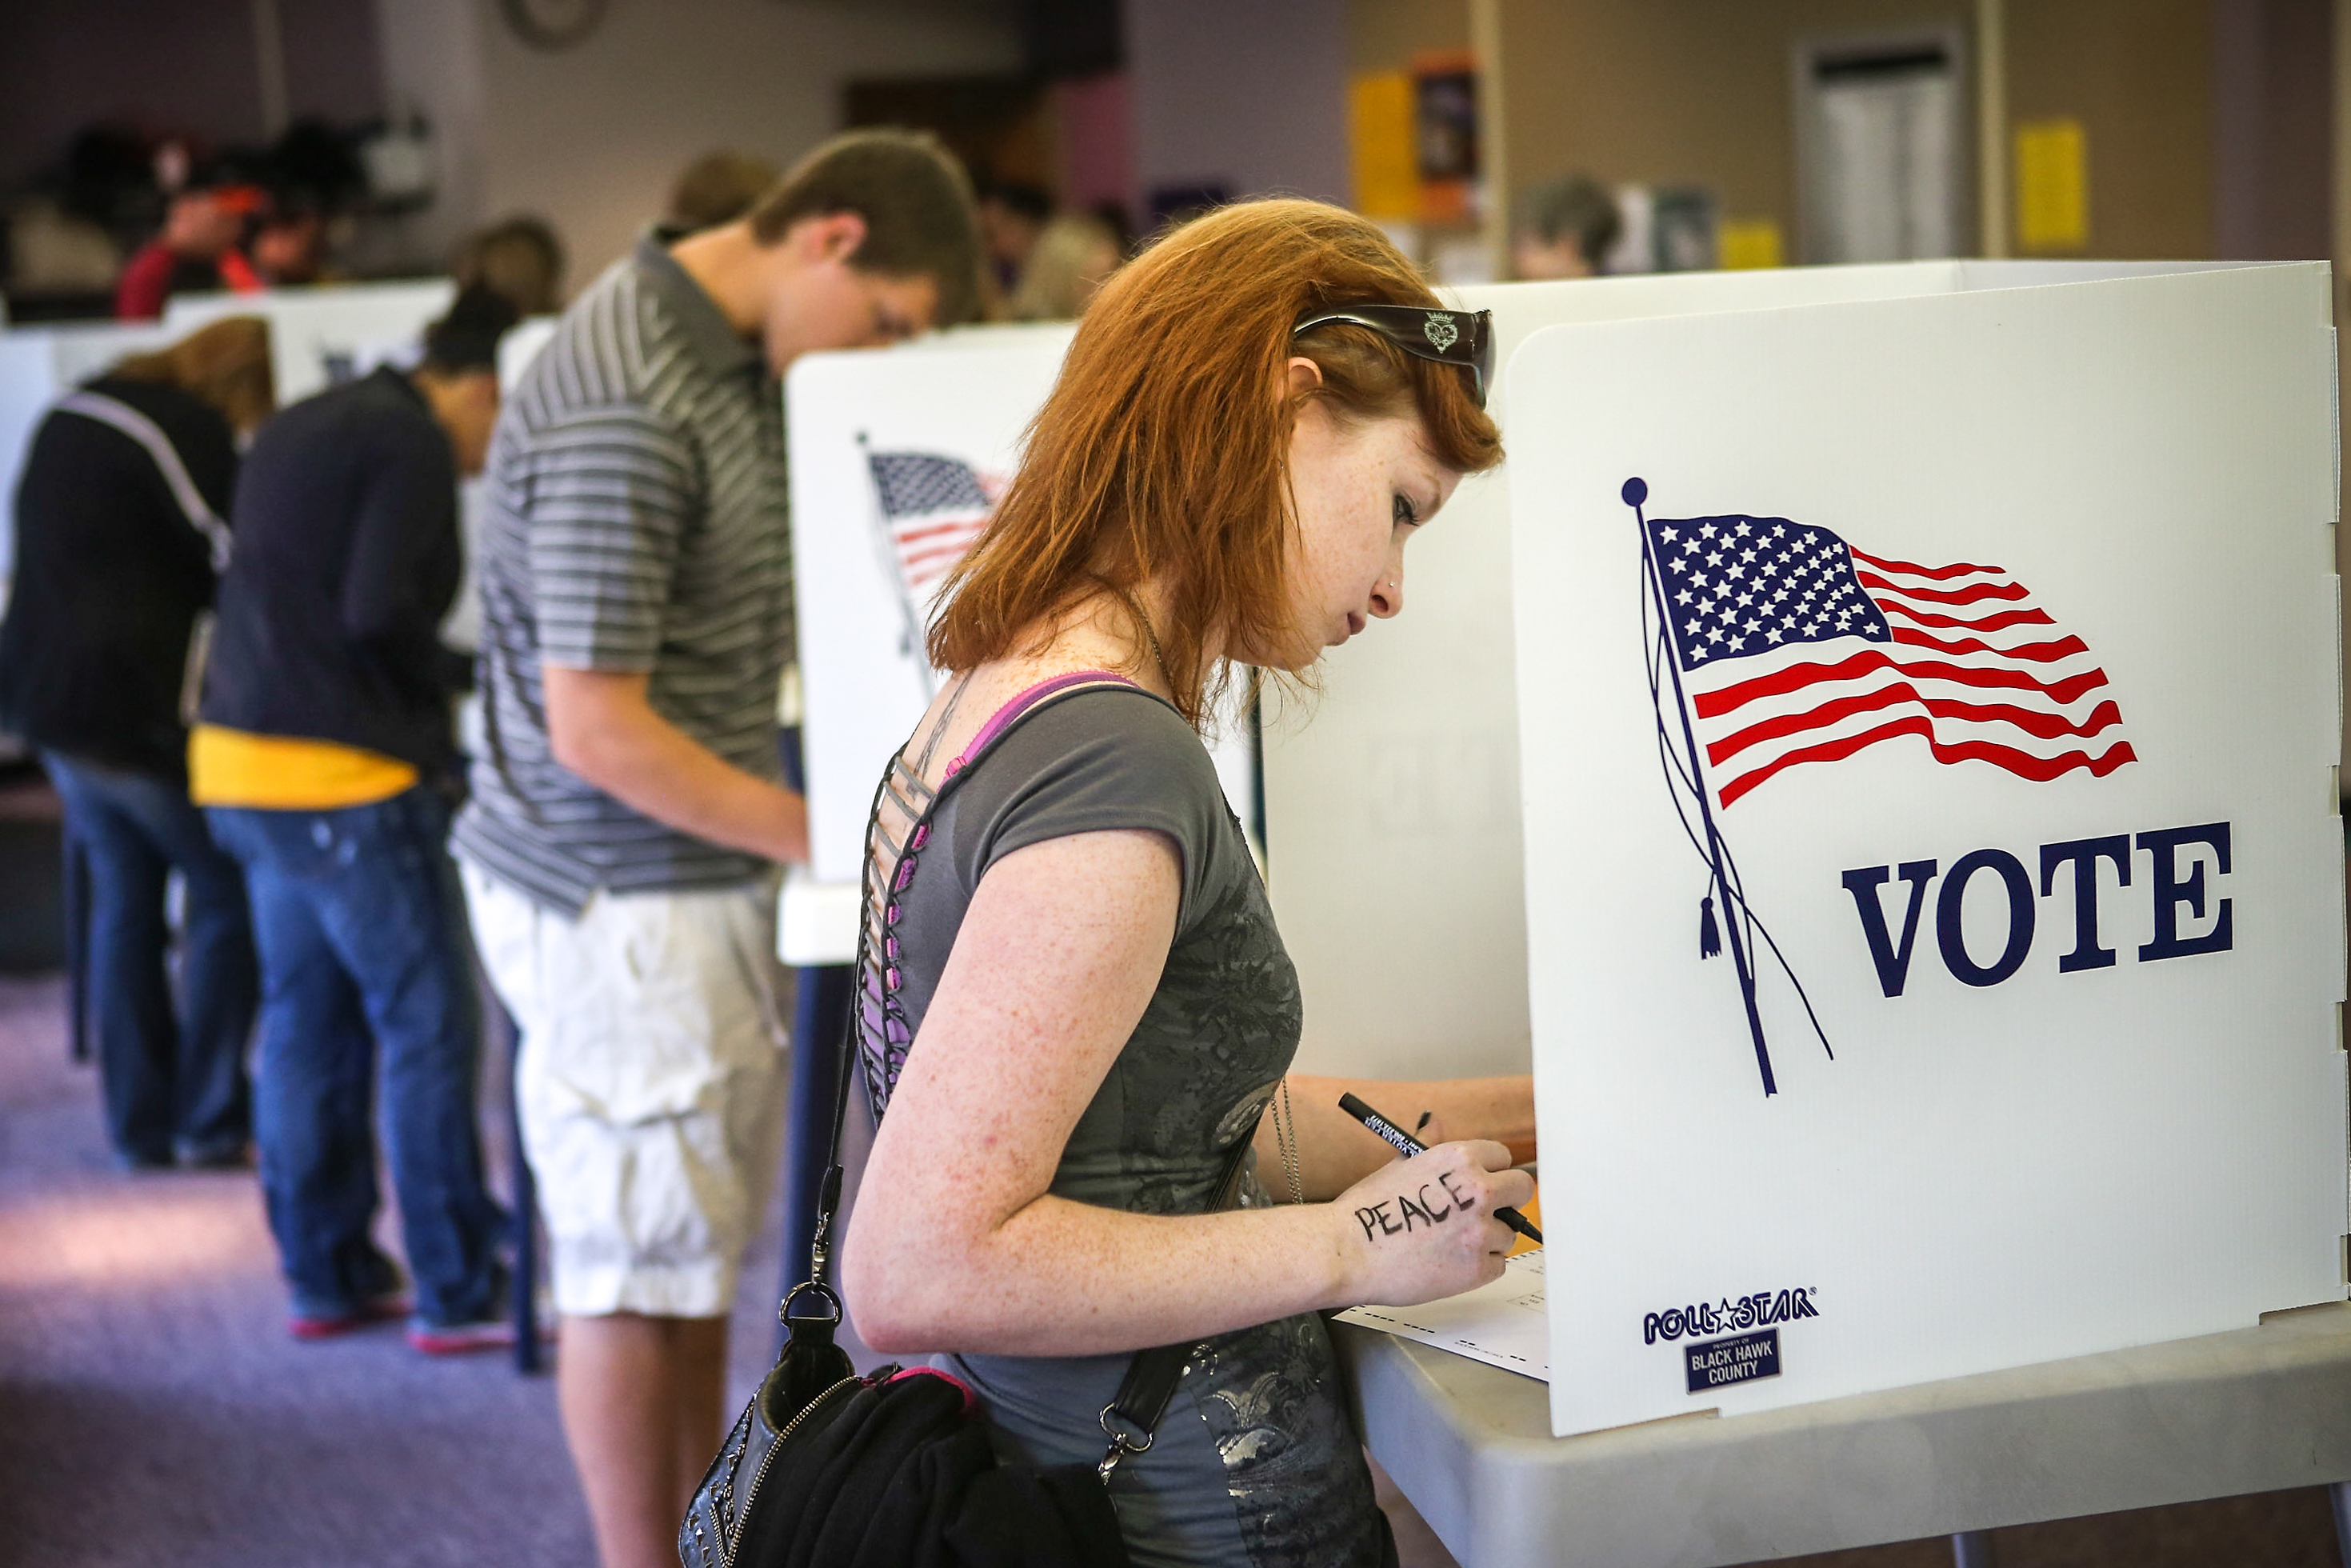 FBI Investigating Voter Registration of 19 Dead Virginians